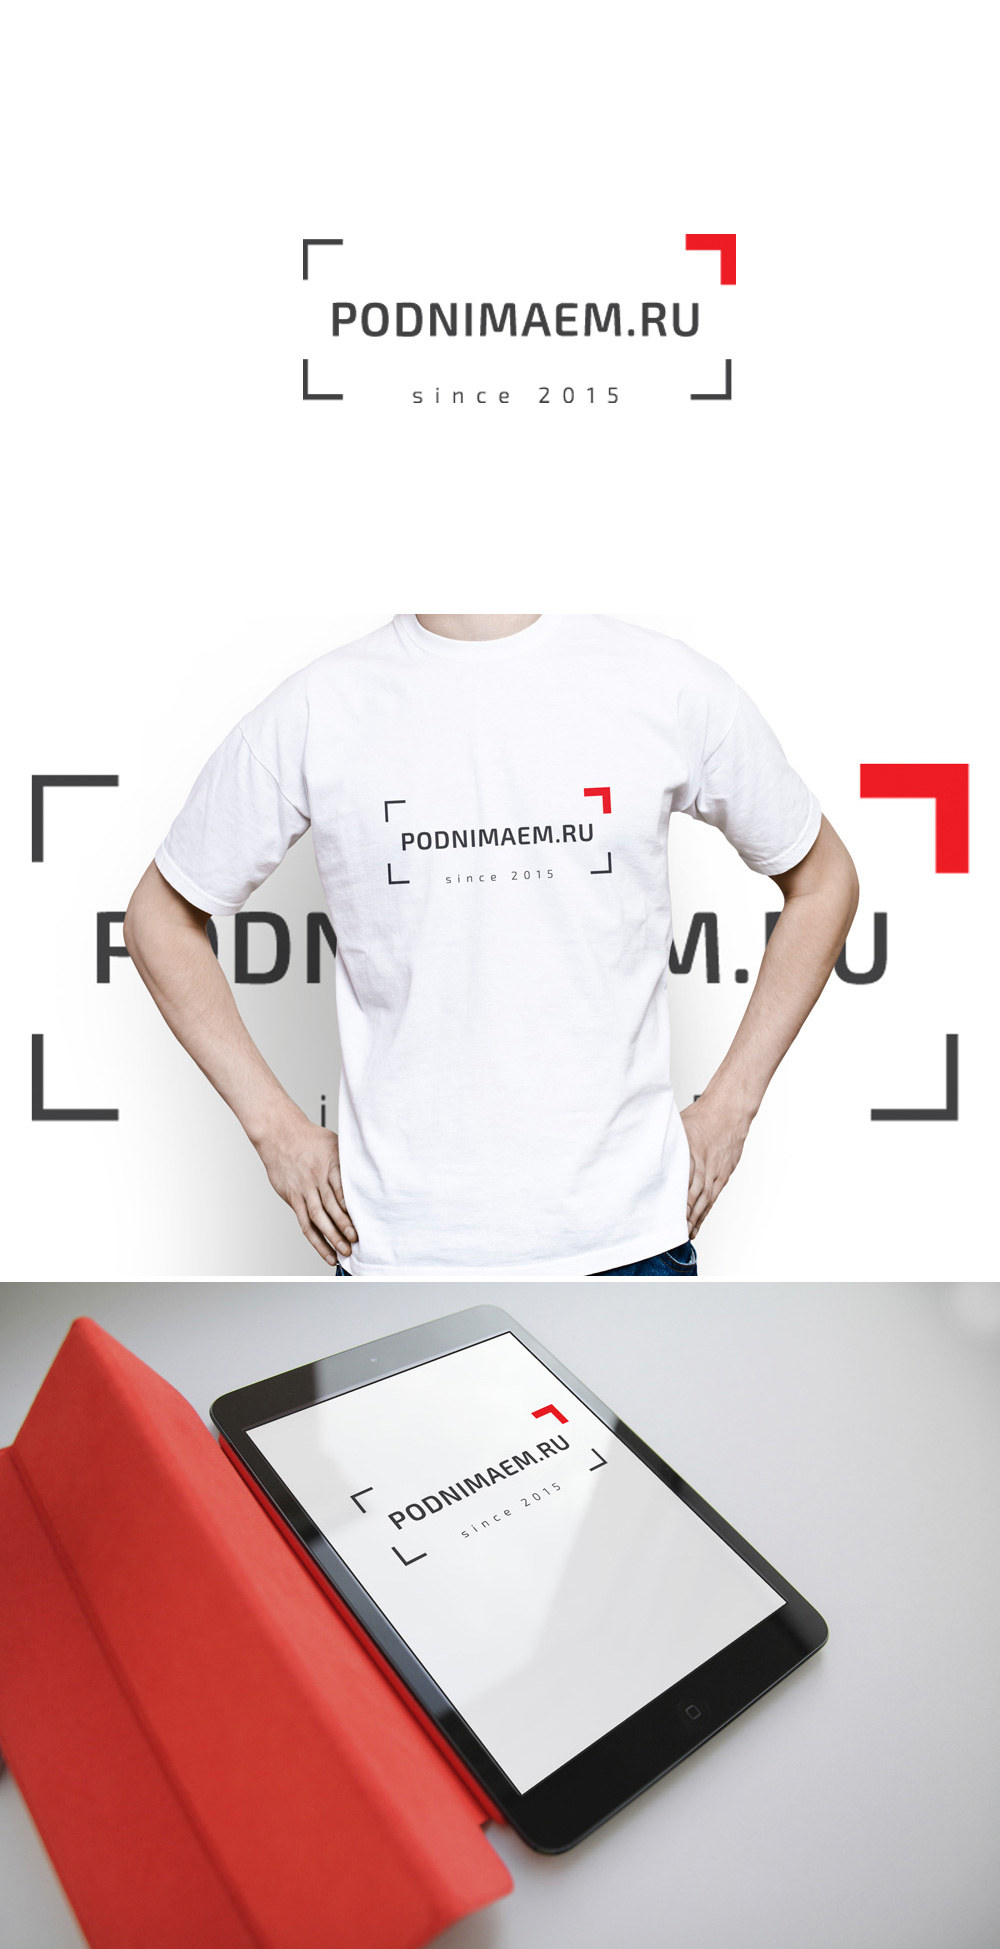 Разработать логотип + визитку + логотип для печати ООО +++ фото f_26355475ea478d65.jpg